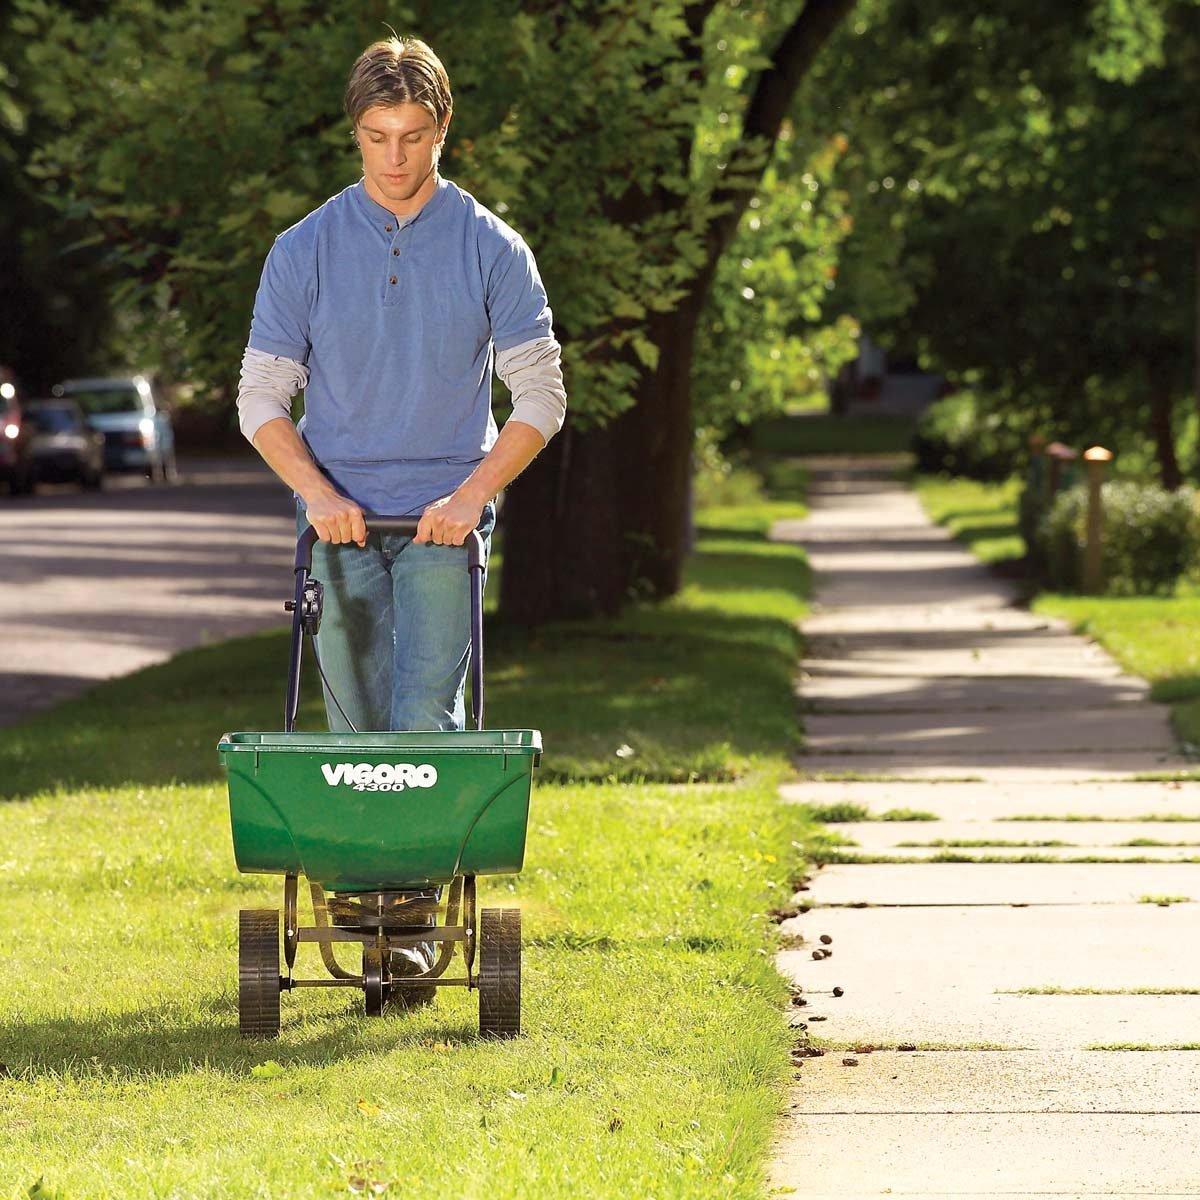 fertilizer spread crabgrass killer